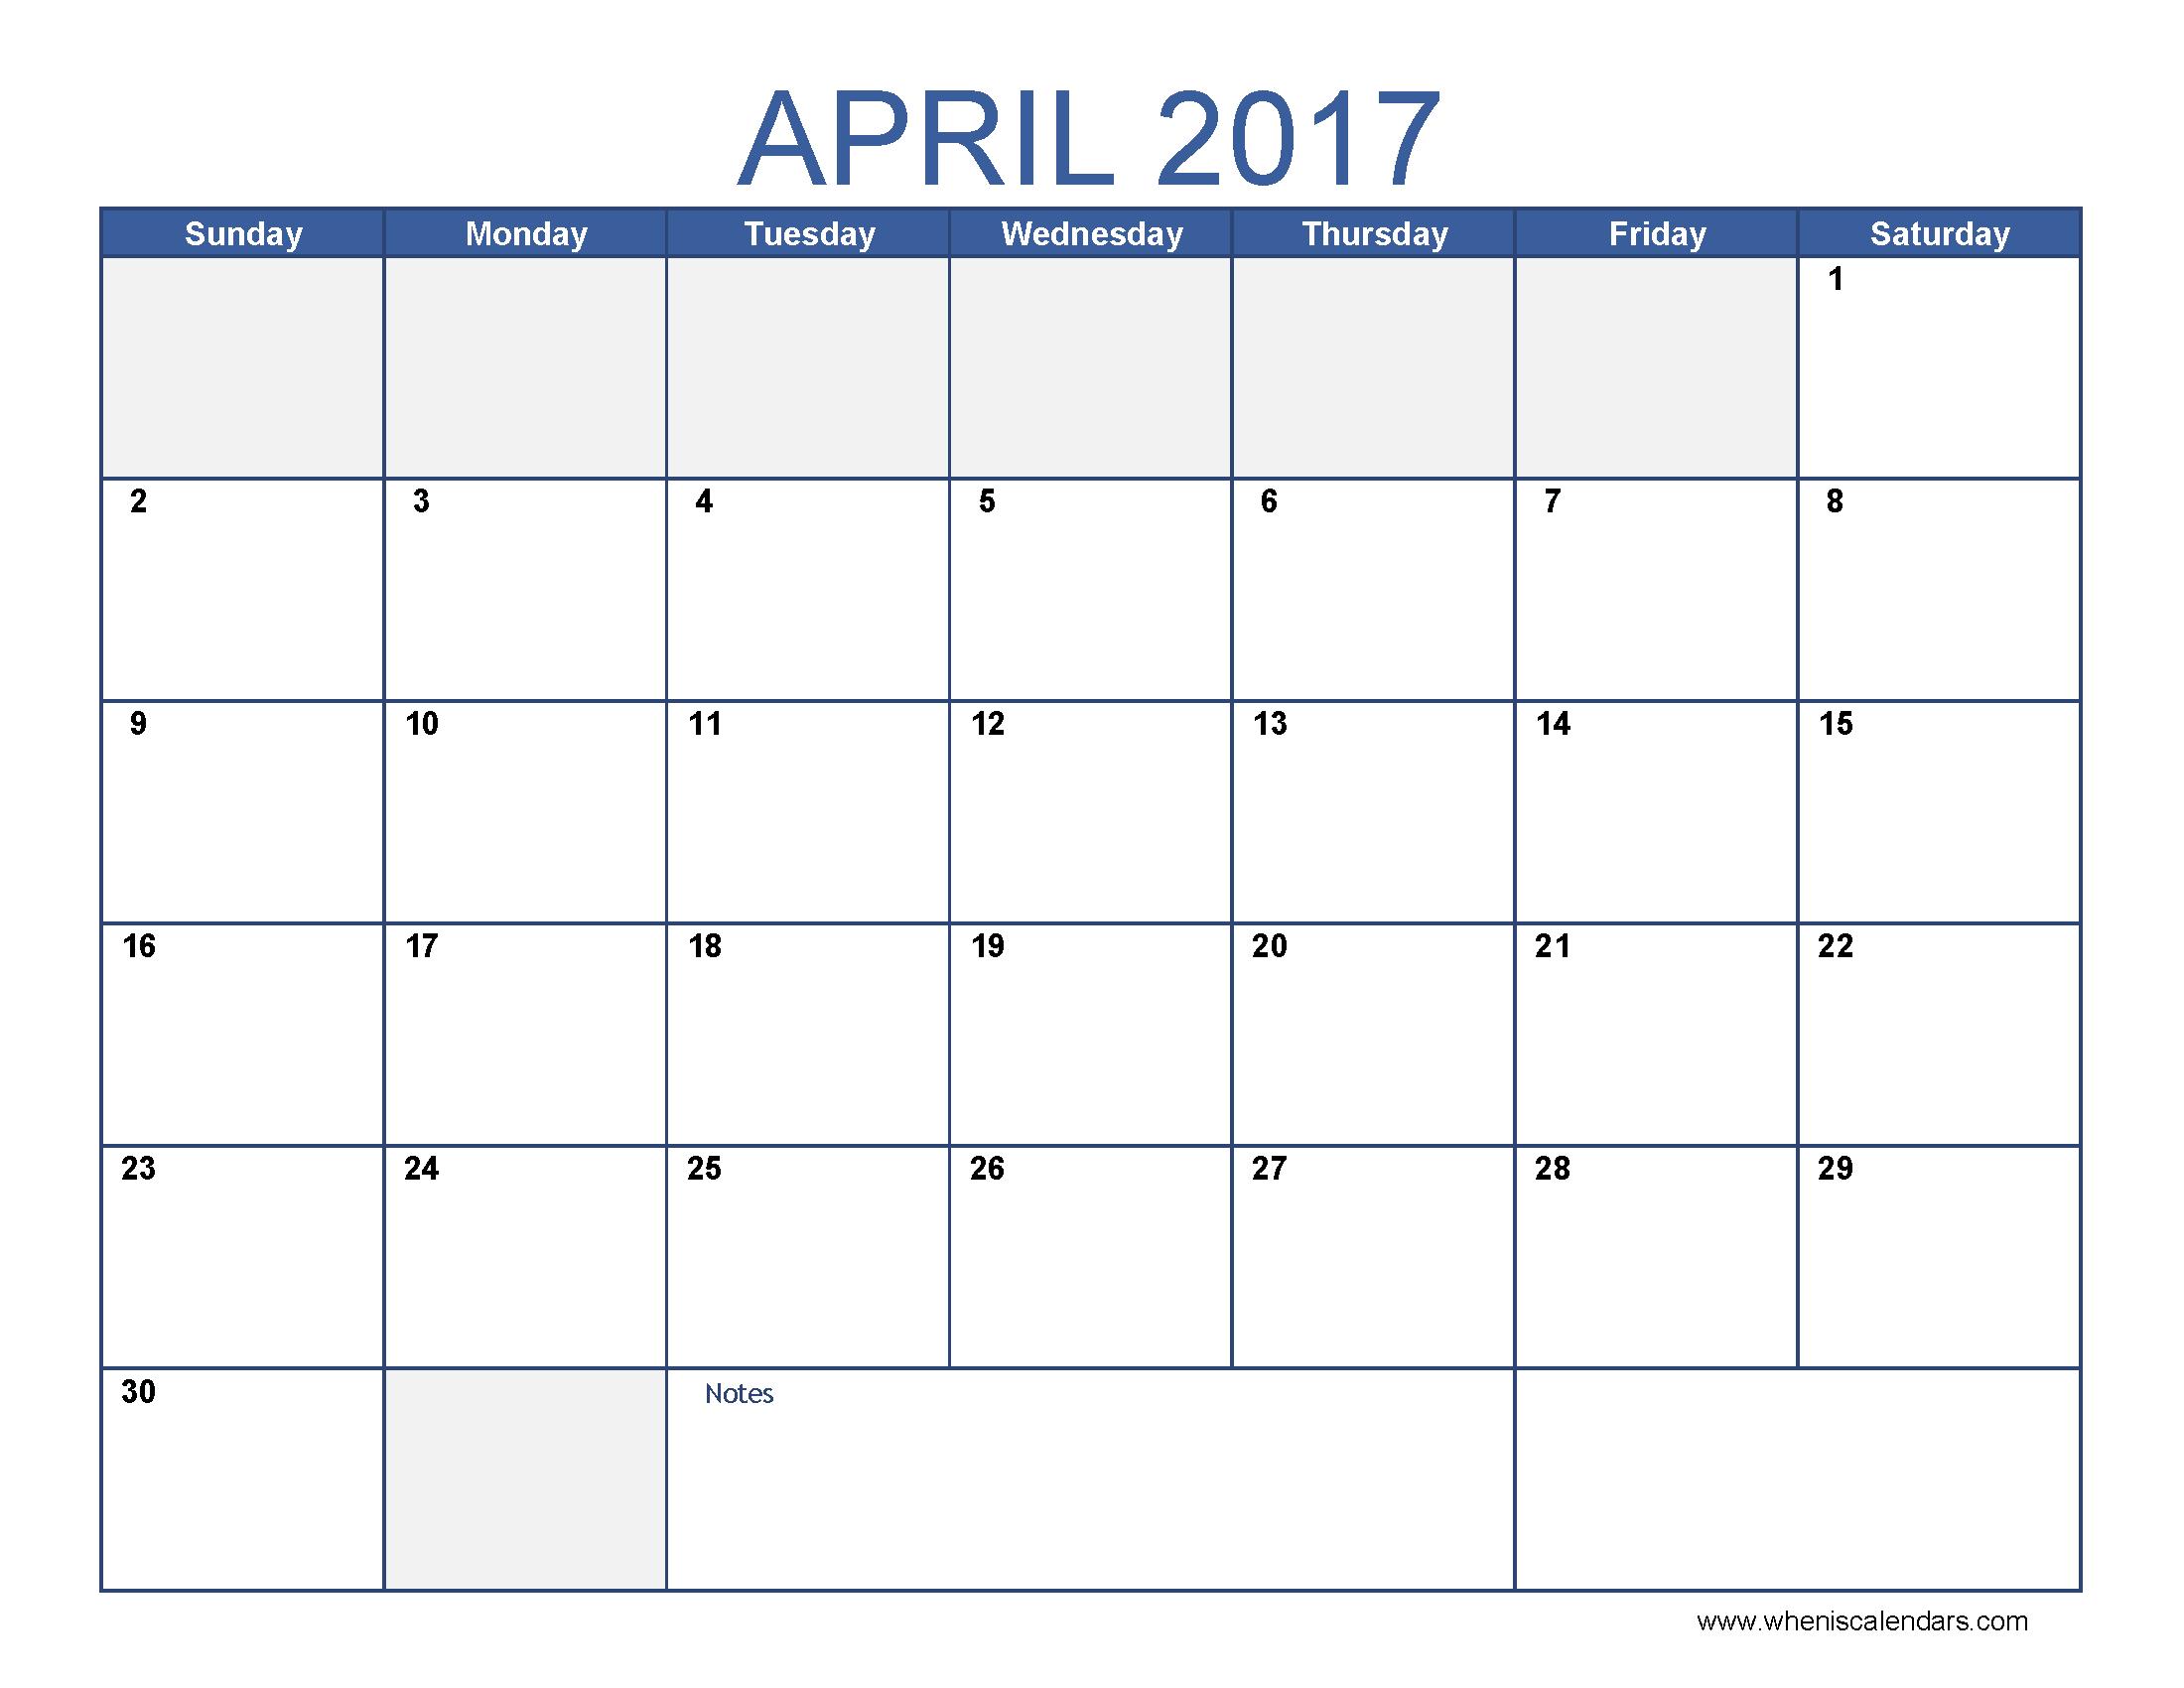 Free April 2017 Calendar Printable Templates – Webelations